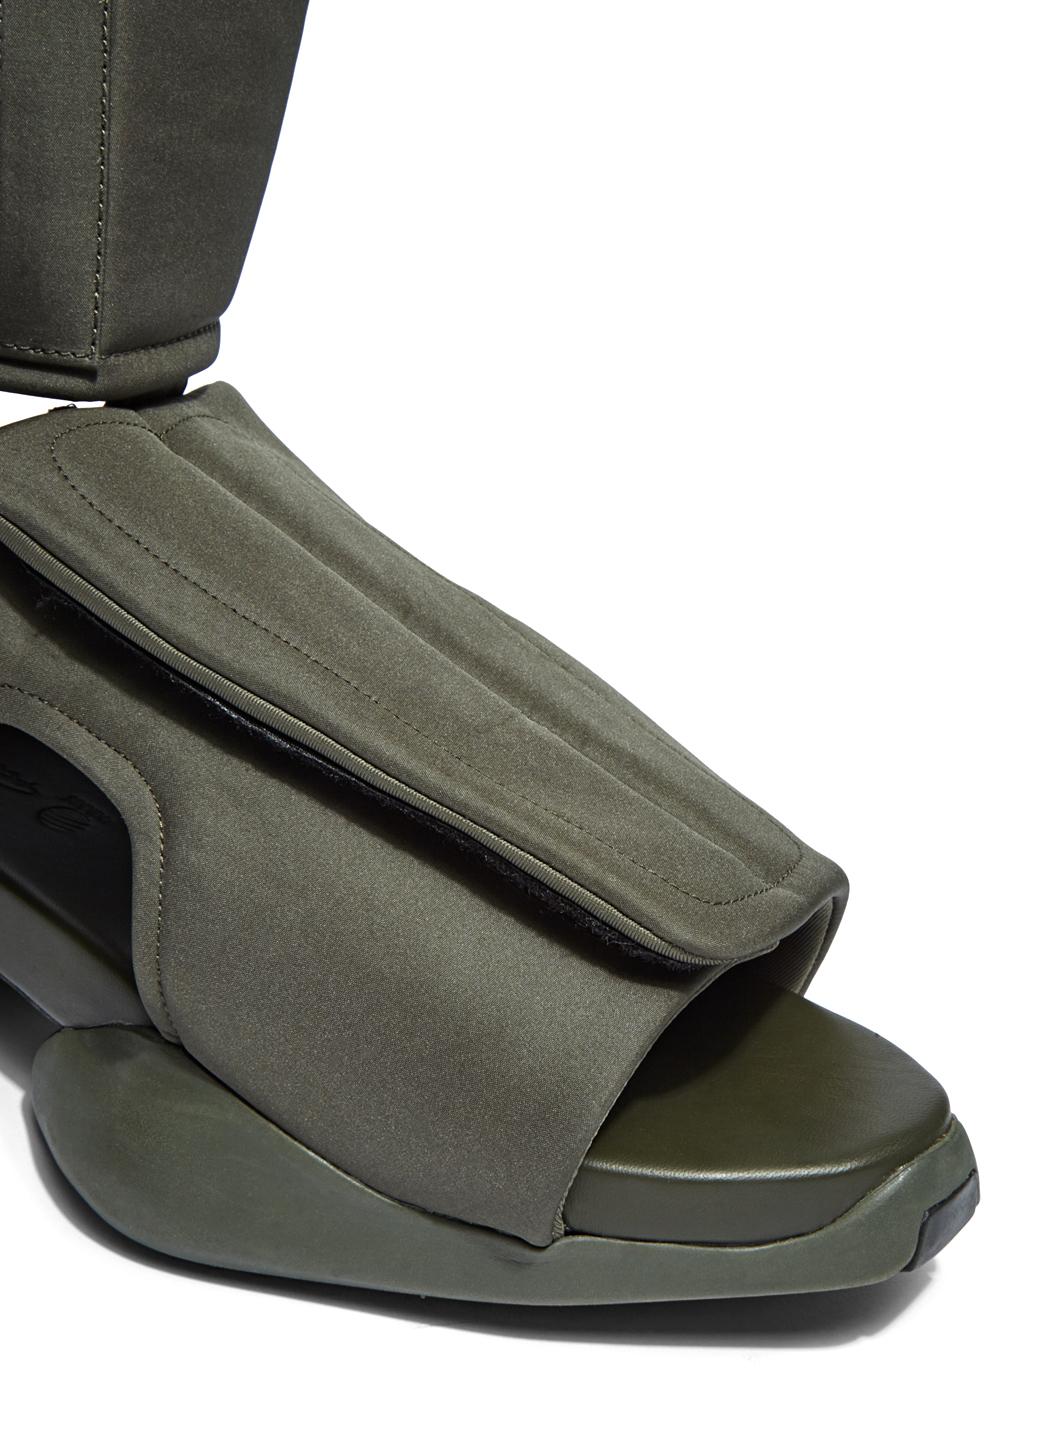 65350175c Rick Owens X Adidas Men s Velcro Strap Ro Cargo Sandals In Khaki in ...